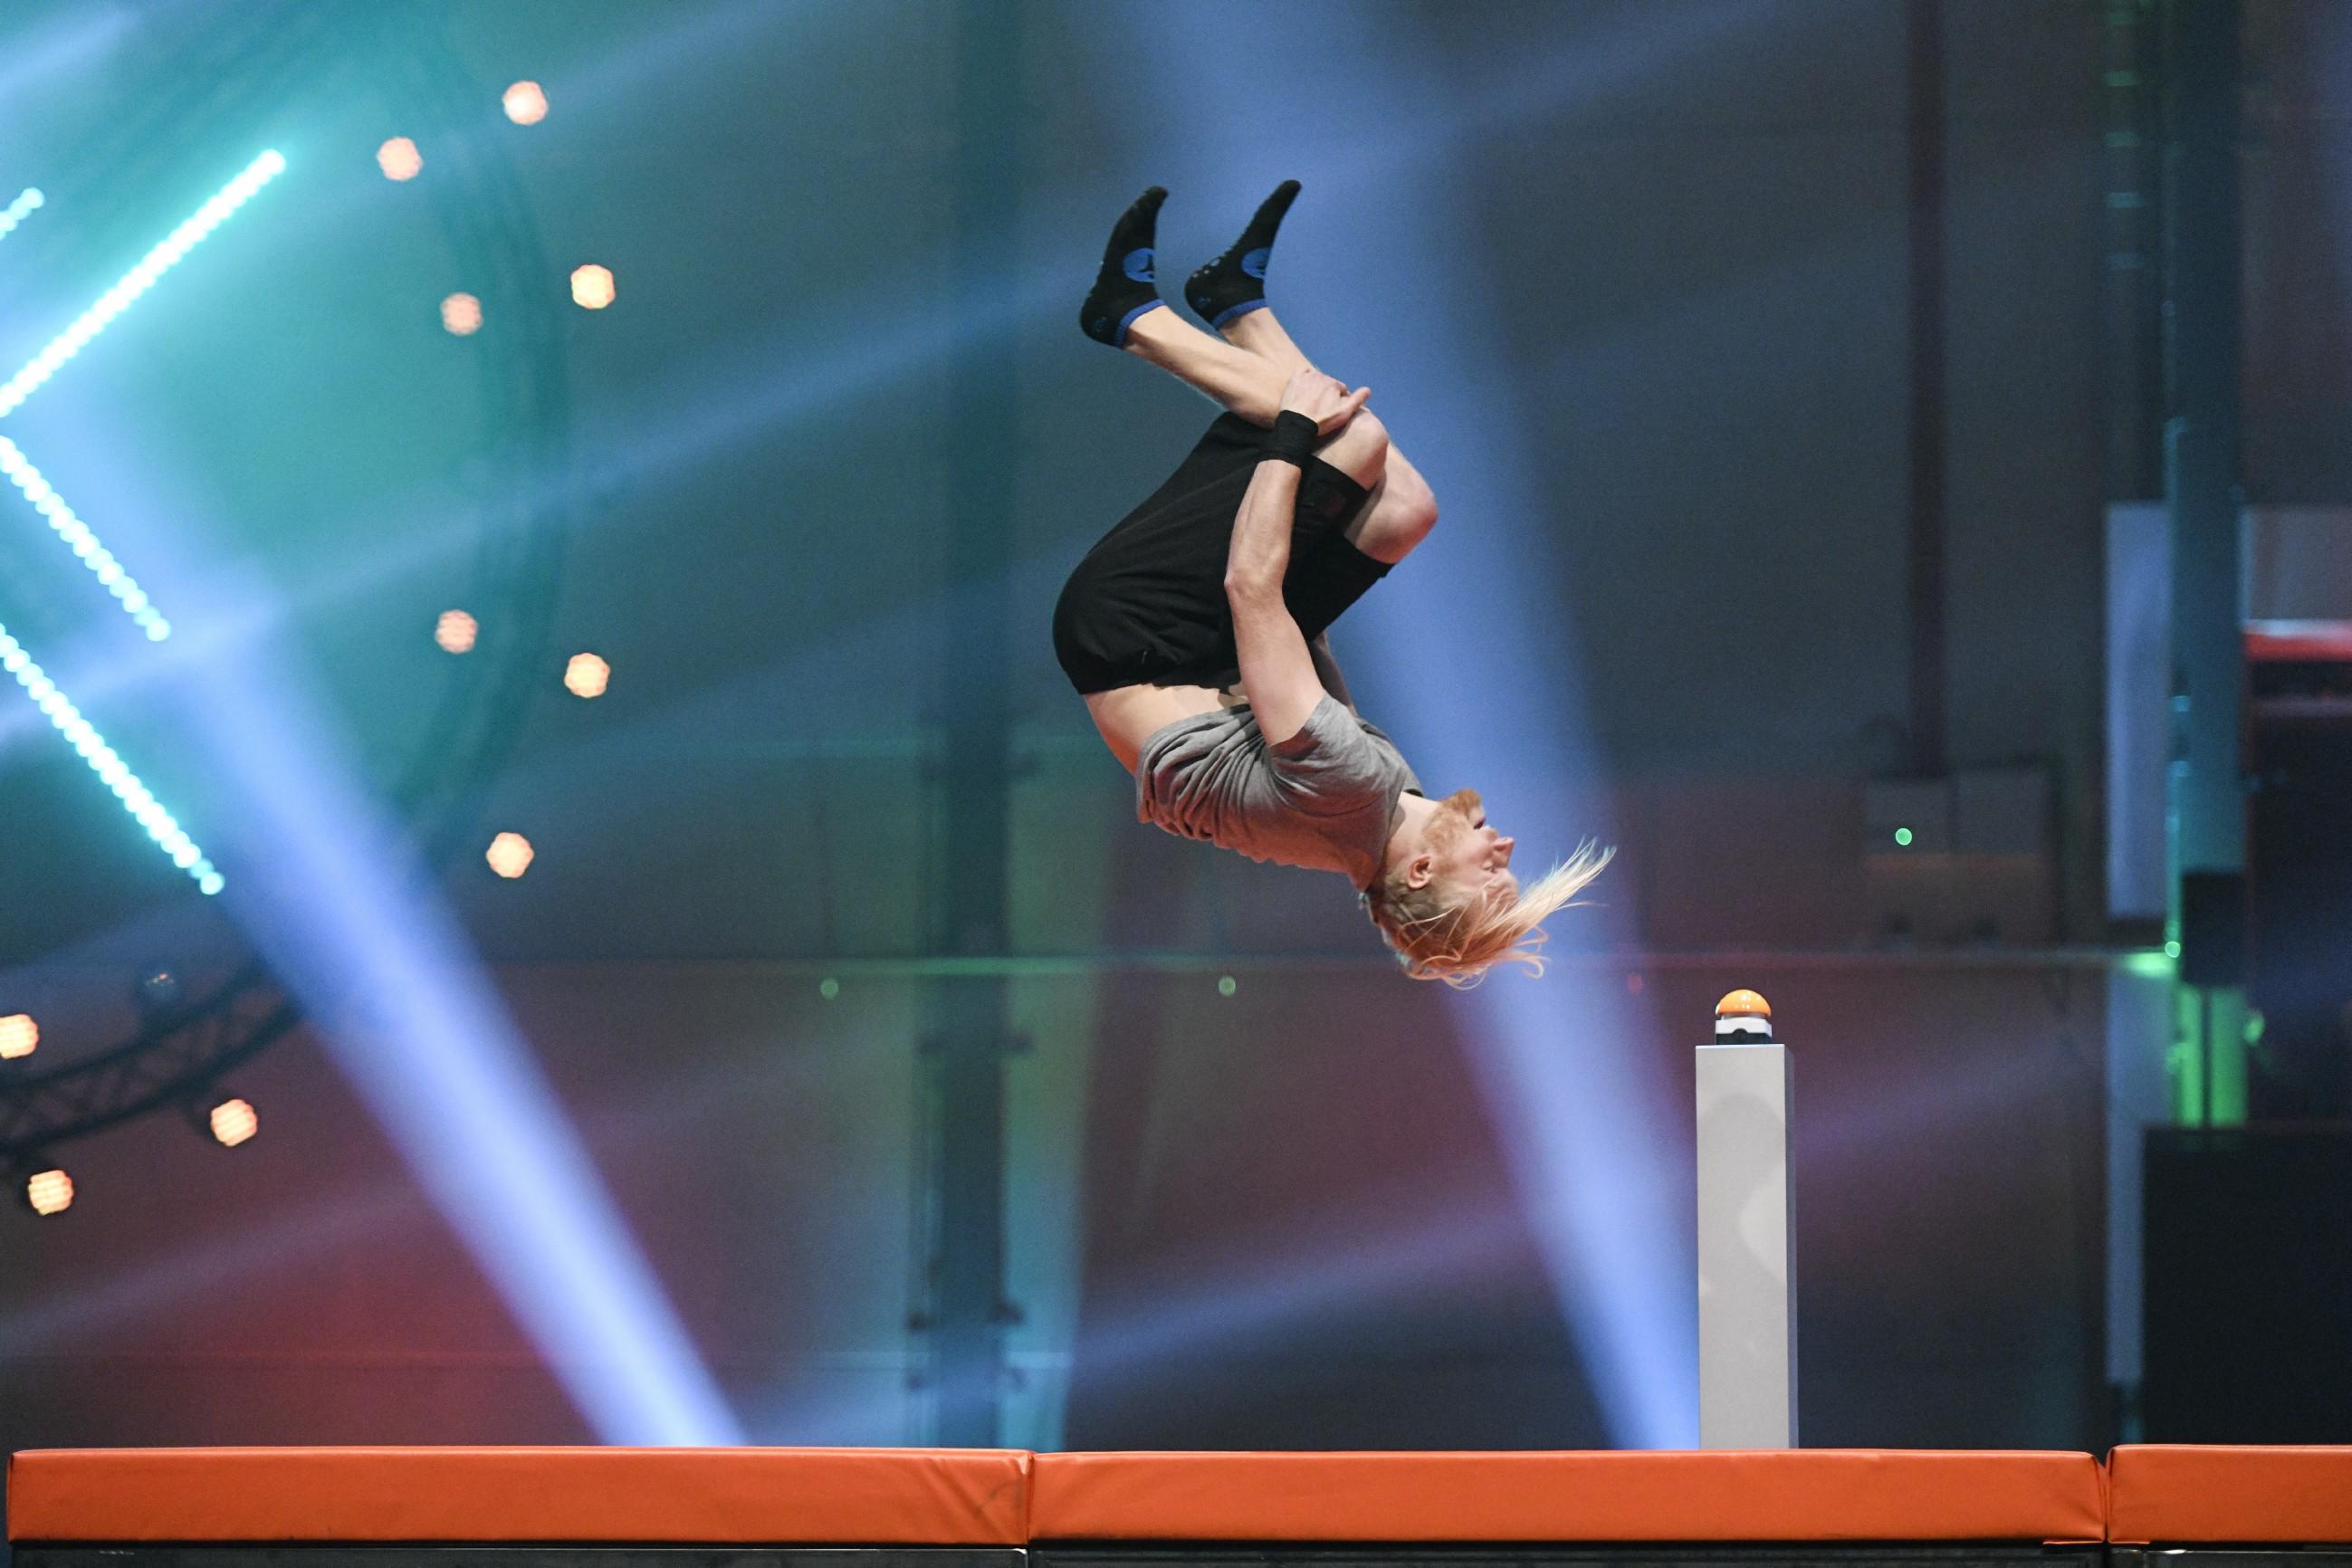 Big Bounce Finale - Kilian Langer